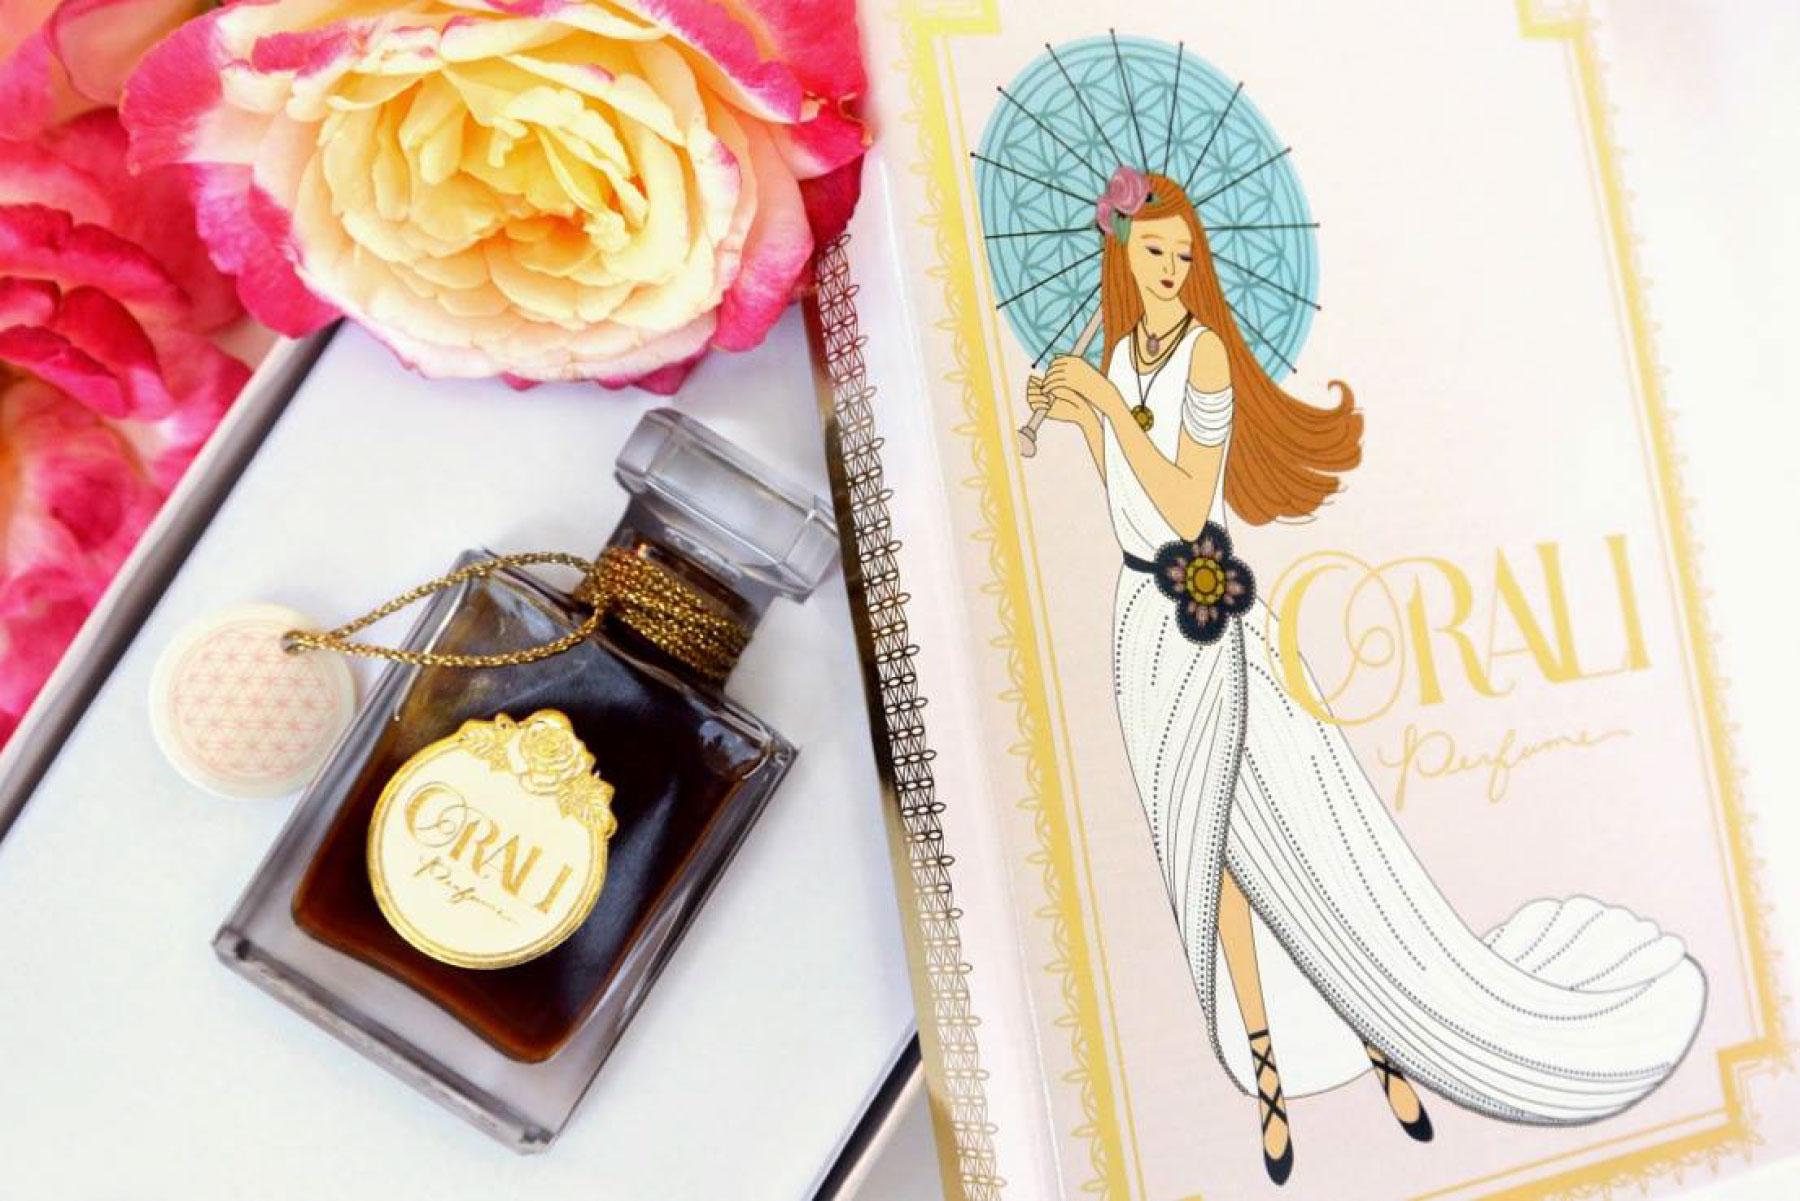 ceci_johnson_orali_perfume_custom_branding_logo_design_business_collateral_illustration_v242__01_13.jpg